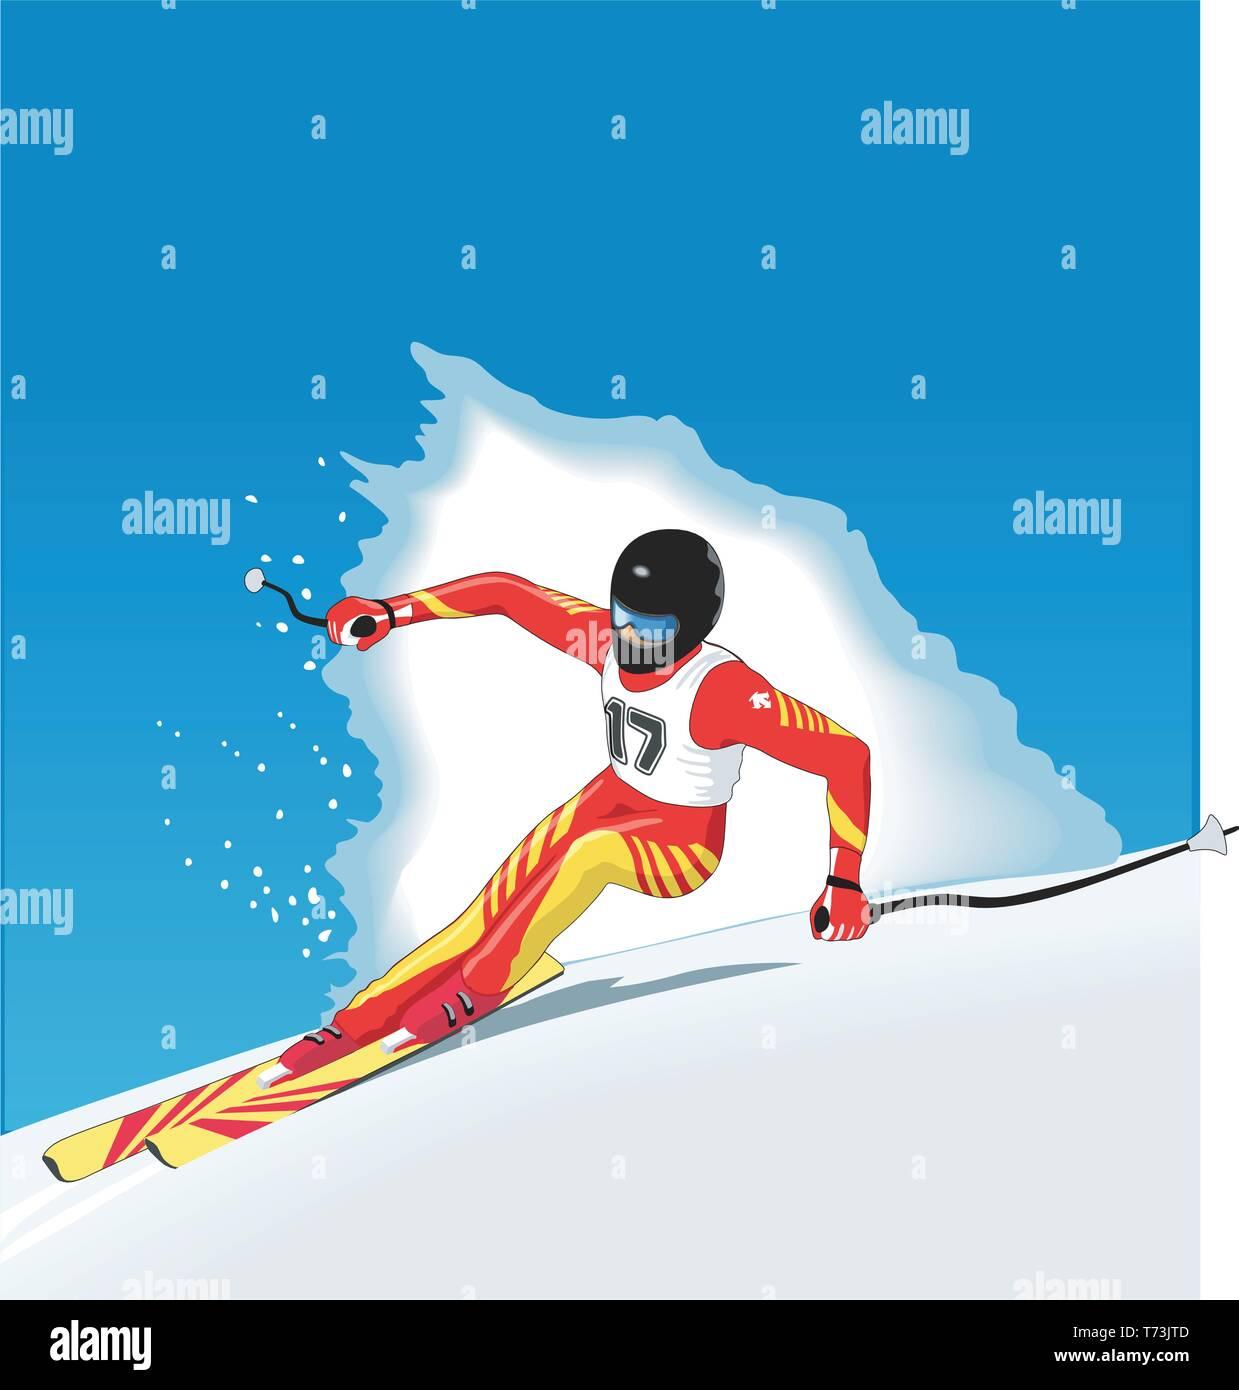 Downhill Racer Vector Illustration - Stock Image